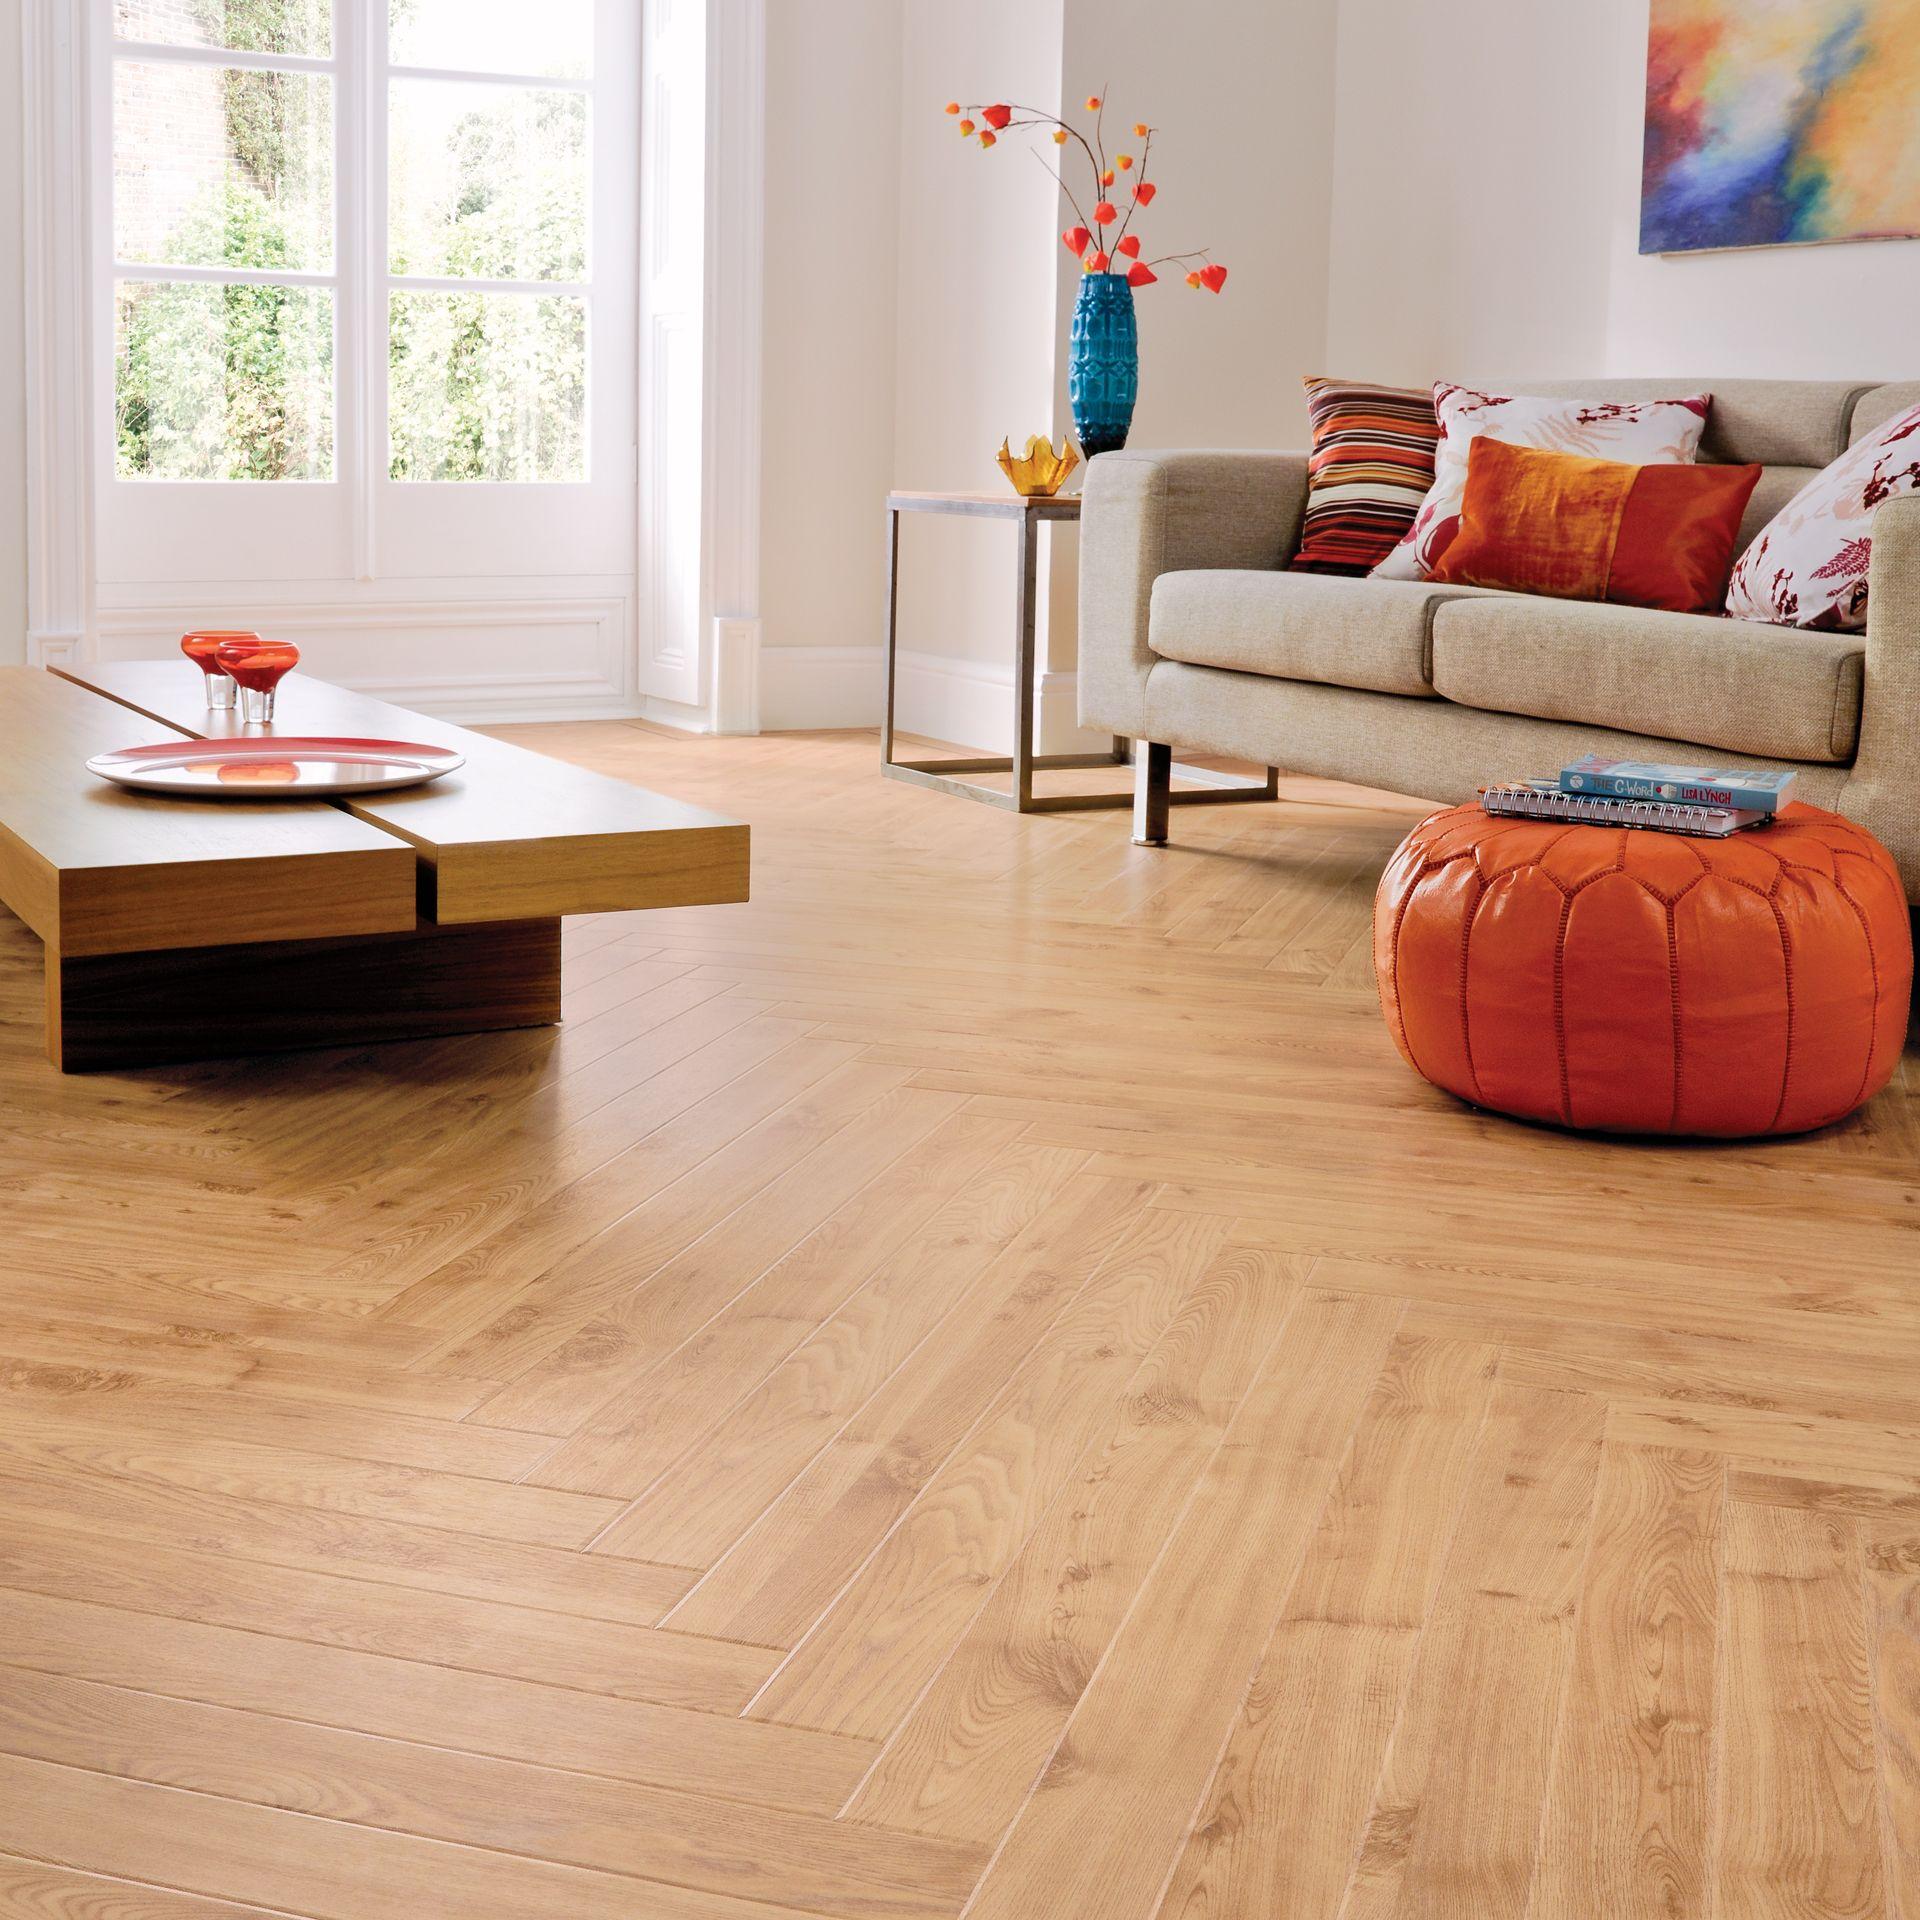 Lounge Flooring Ideas for Your Home | Vinyl flooring ...